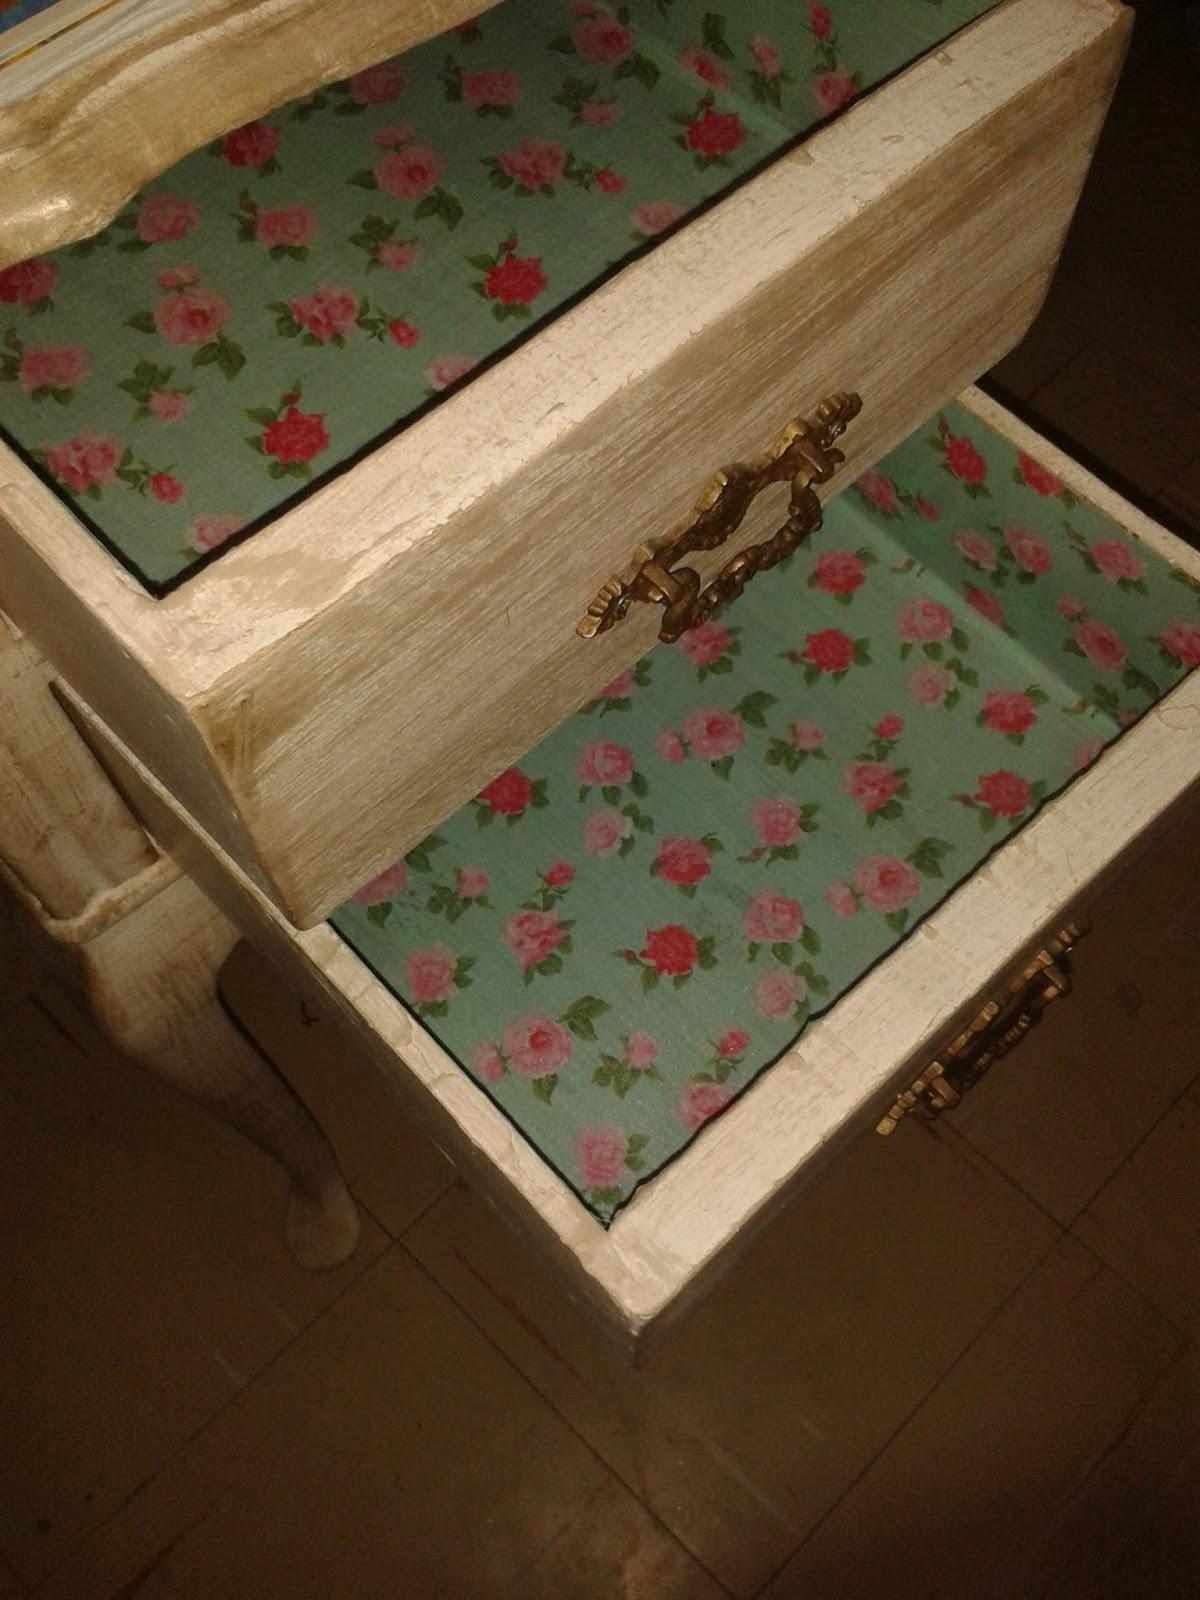 P gina da luiza forrar gavetas lindo viciante e decorativo - Papel para forrar cajones ...